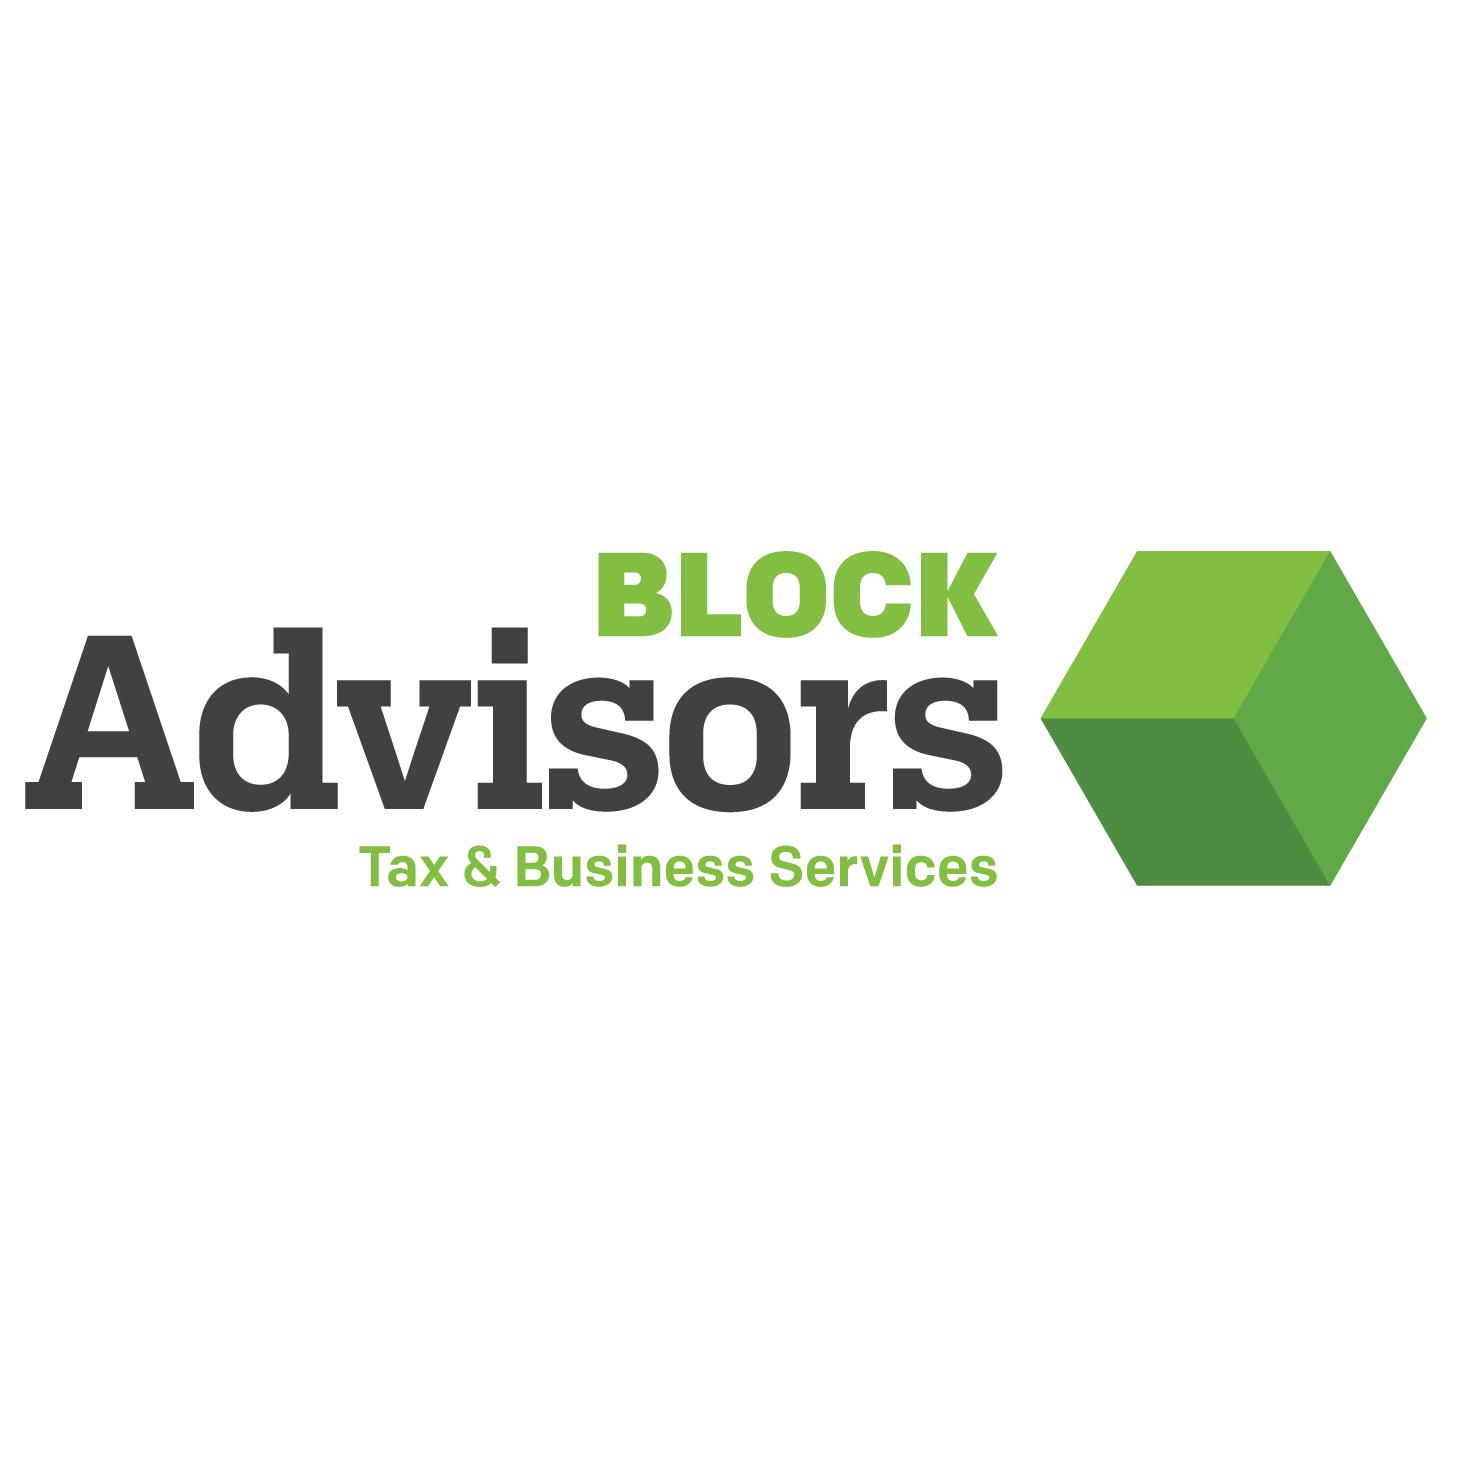 Block Advisors - Tucson, AZ 85711 - (520)745-1138 | ShowMeLocal.com